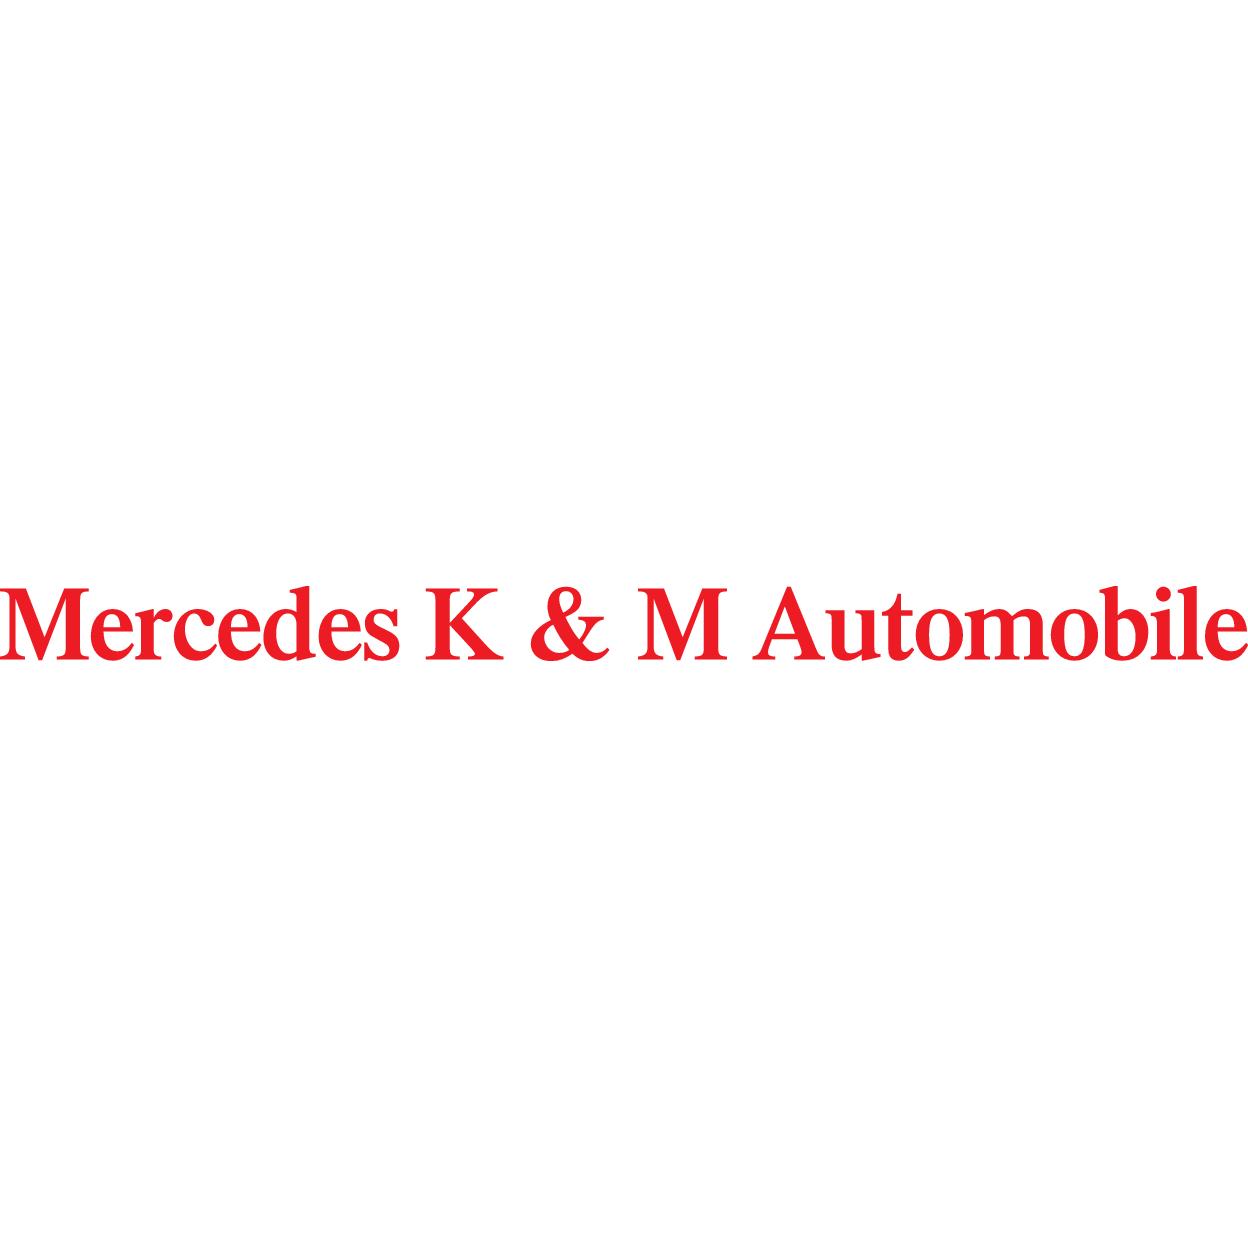 Bild zu K&M Automobile Mercedesteile in Berlin